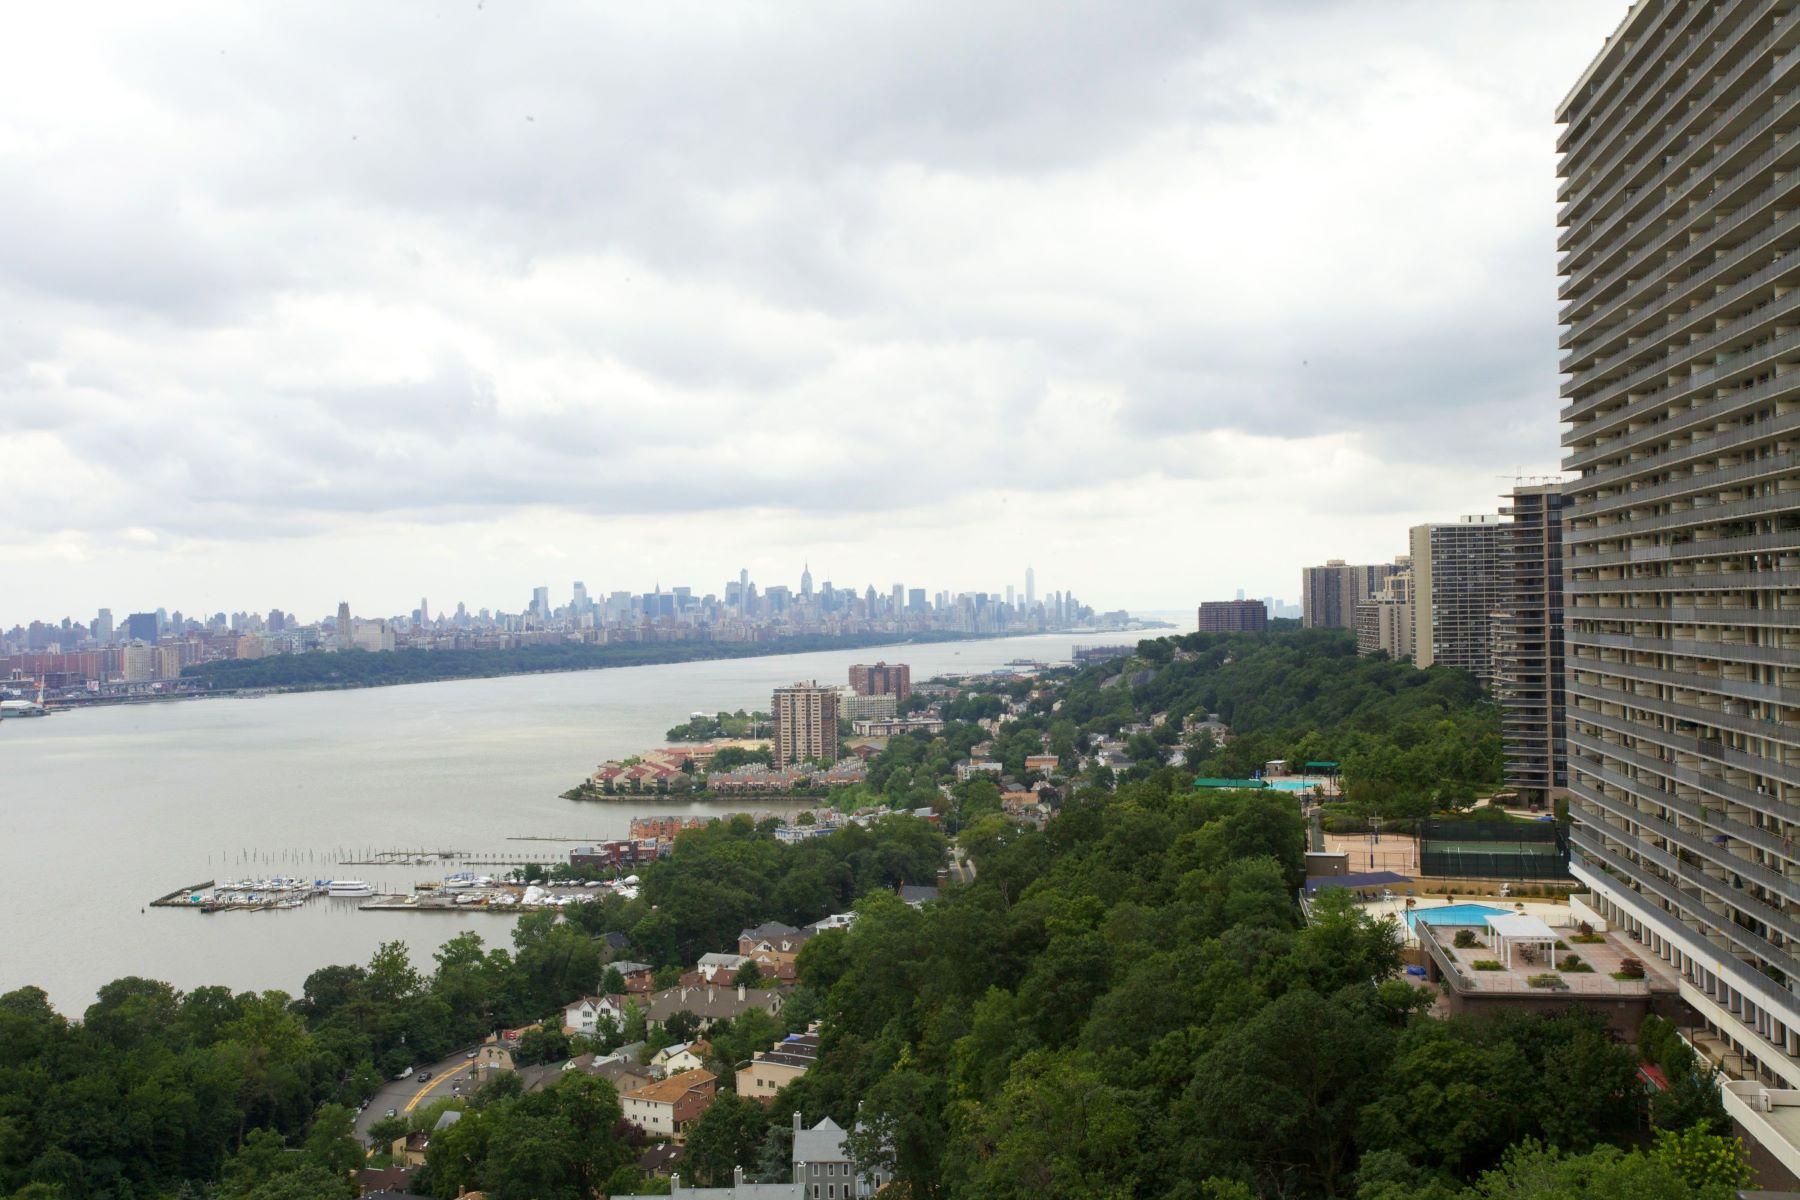 共管式独立产权公寓 为 销售 在 River Ridge Condo for Sale 200 Old Palisade Road 11-12F 李堡, 新泽西州, 07024 美国